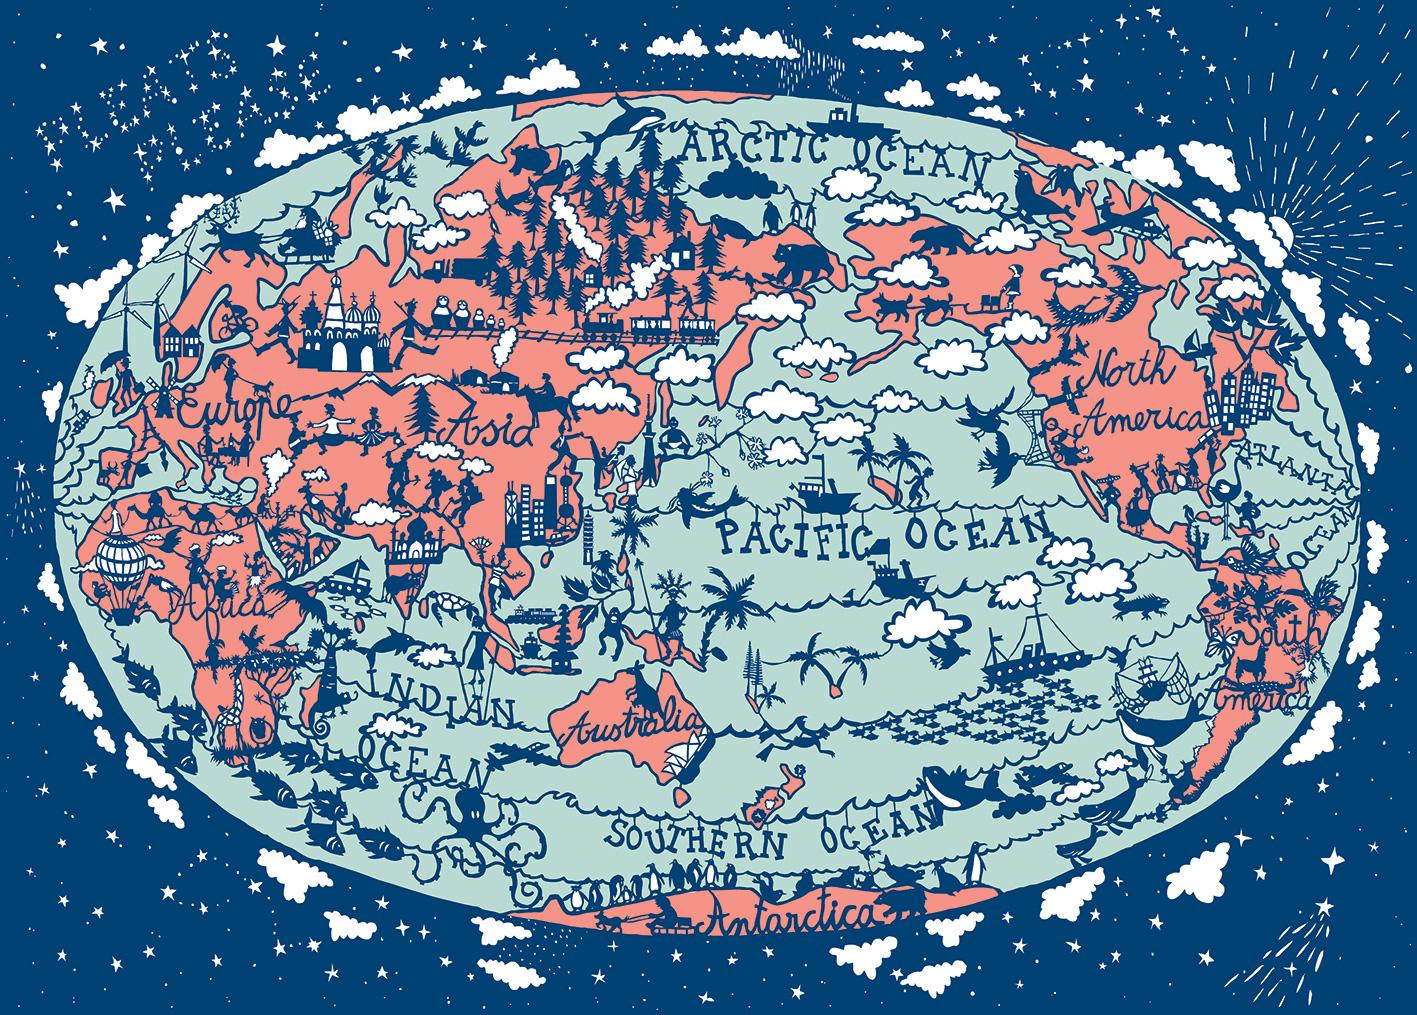 Julie Marabelle WORLD MAP ISSEY MIYAKE - World map please